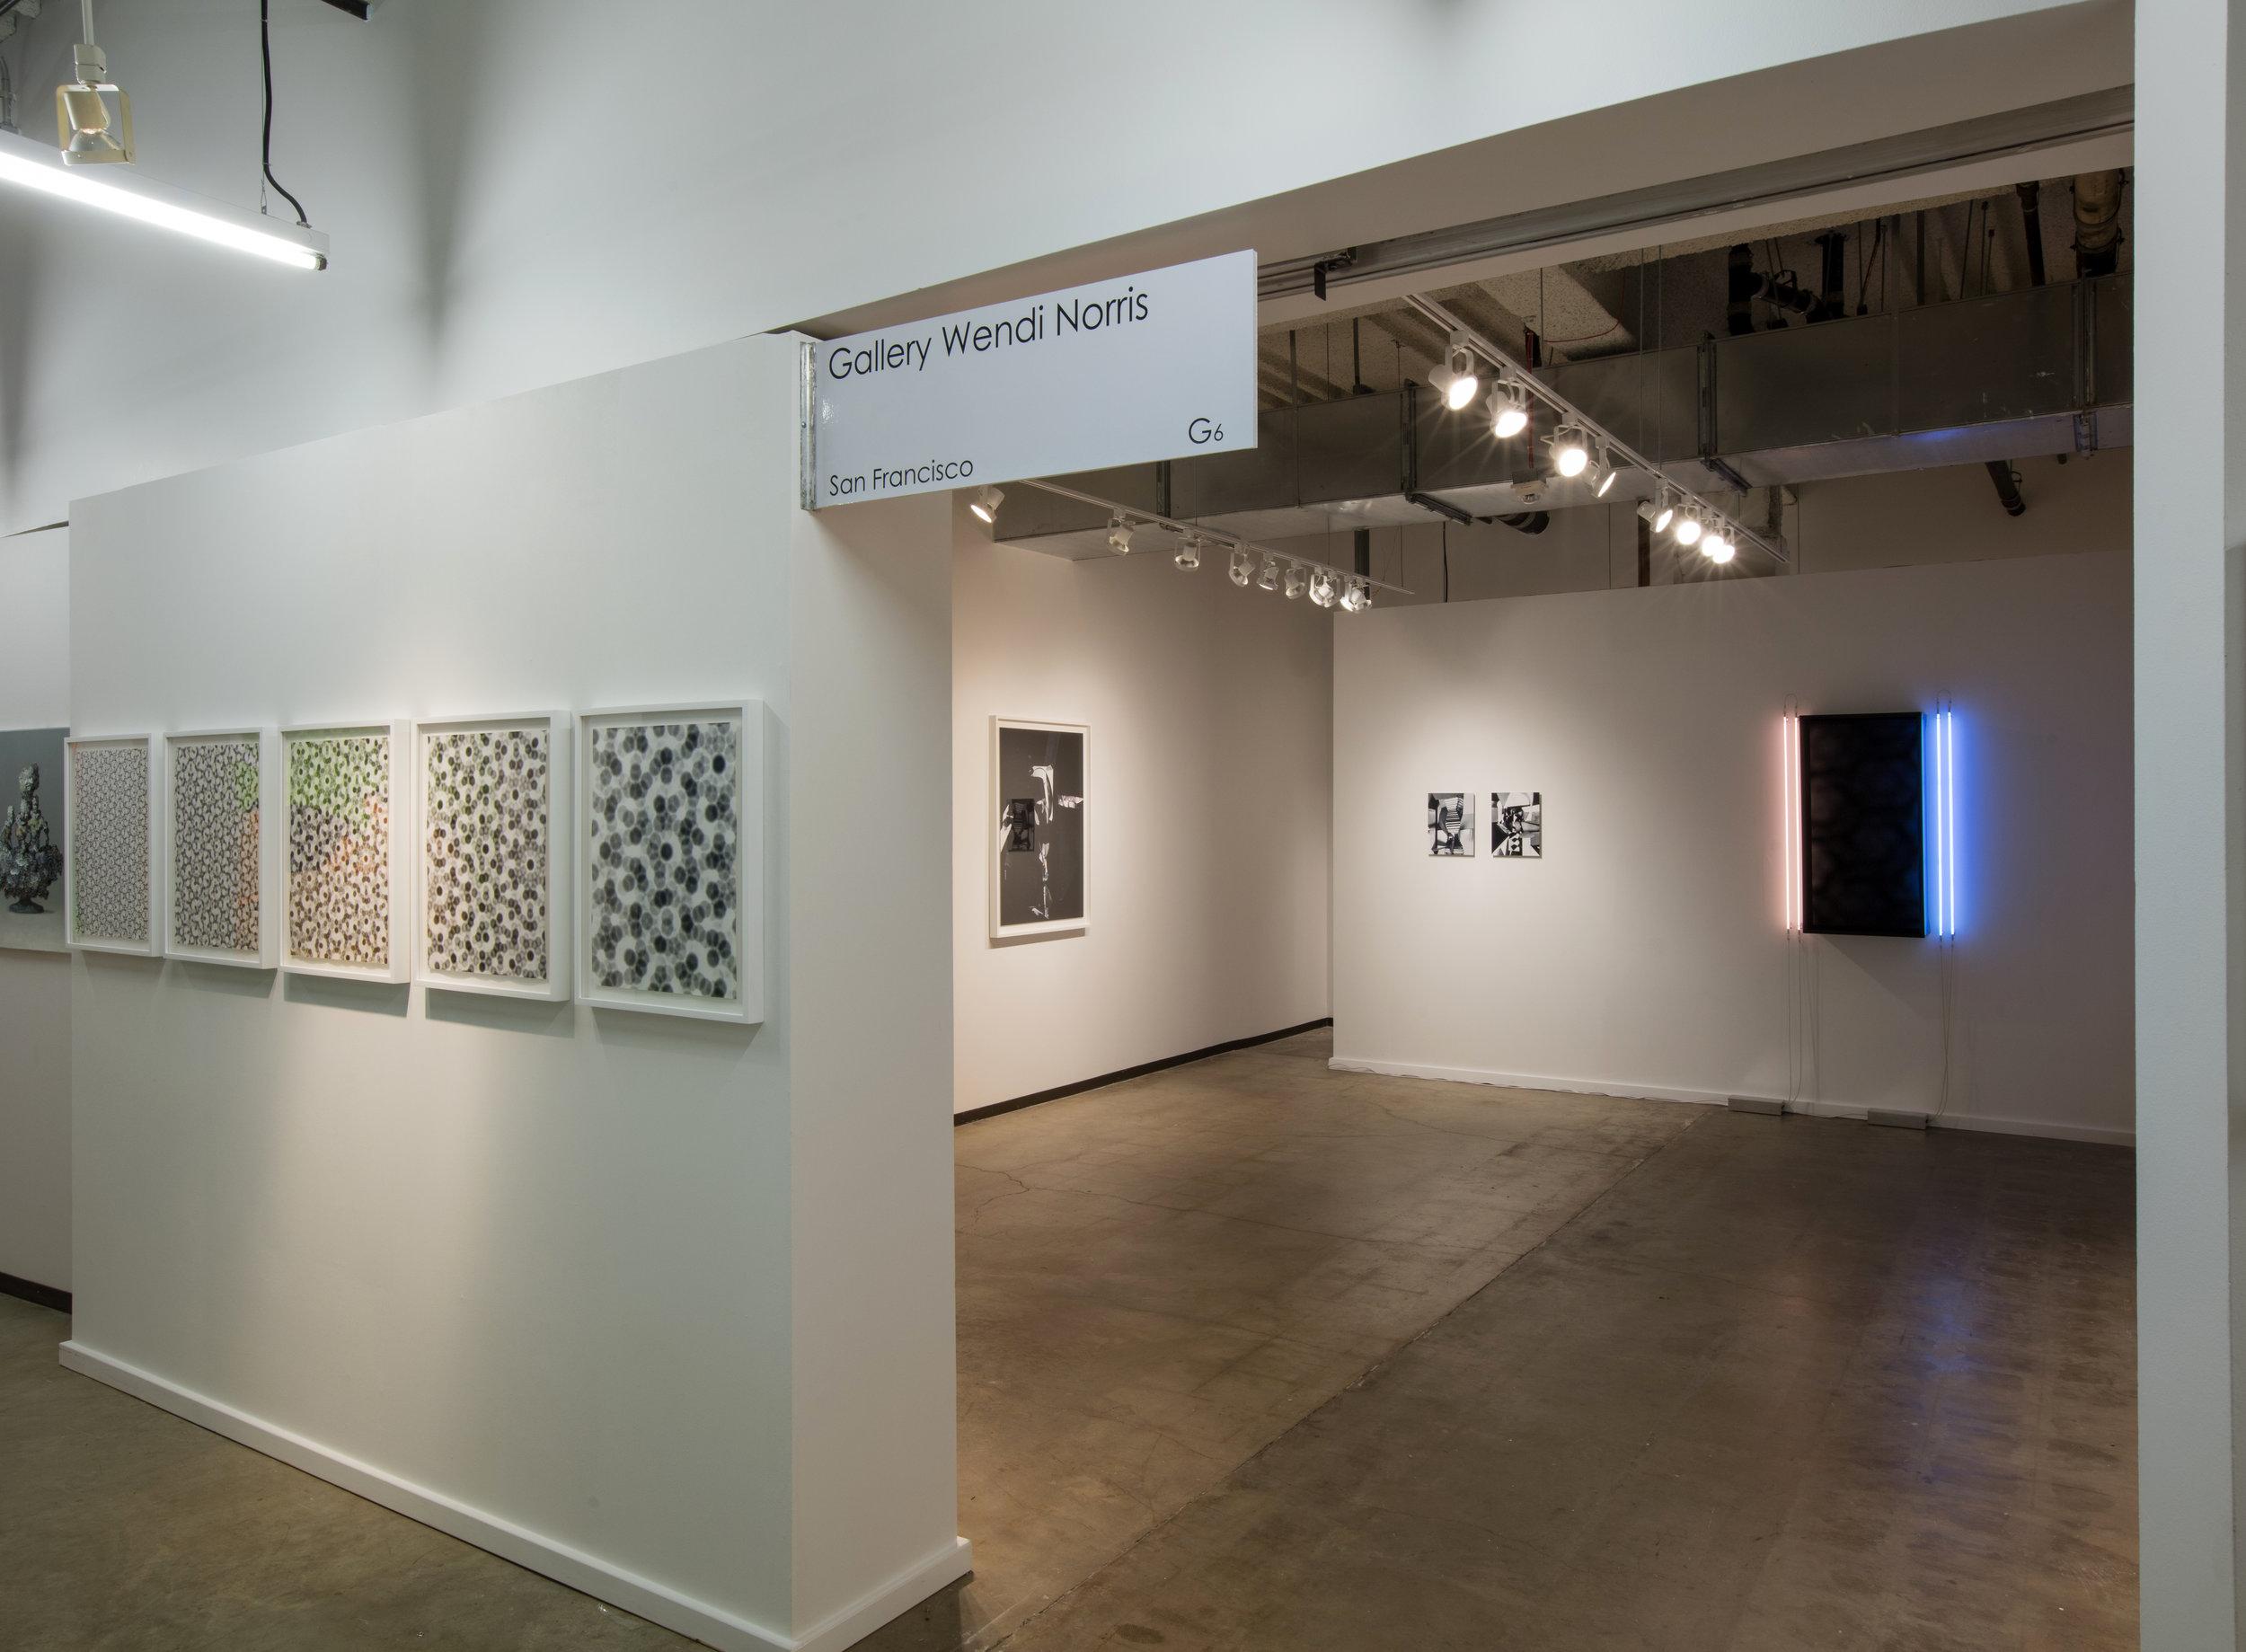 Dallas Art Fair 2016,  installation view, Fashion Industry Gallery, 1807 Ross Avenue, Dallas, TX, April 14 - 17, 2016